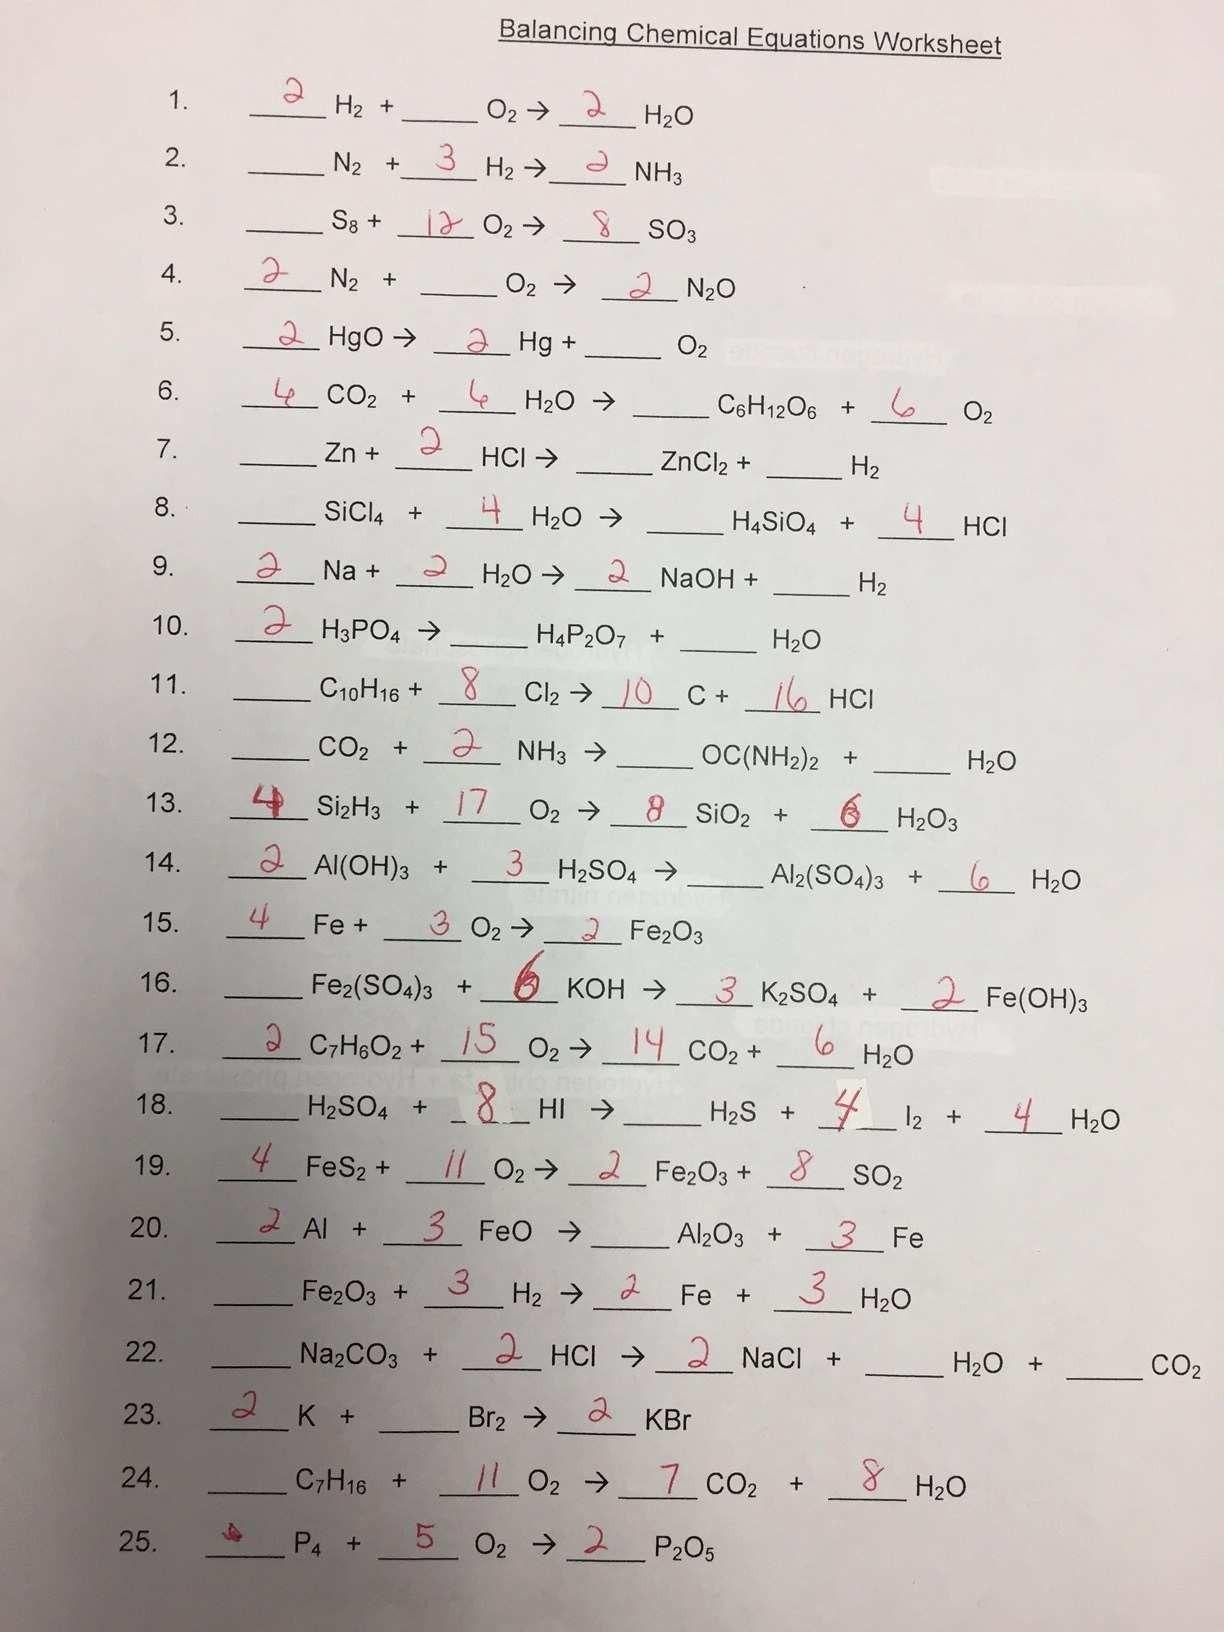 Inspirational Phet Balancing Chemical Equations Worksheet